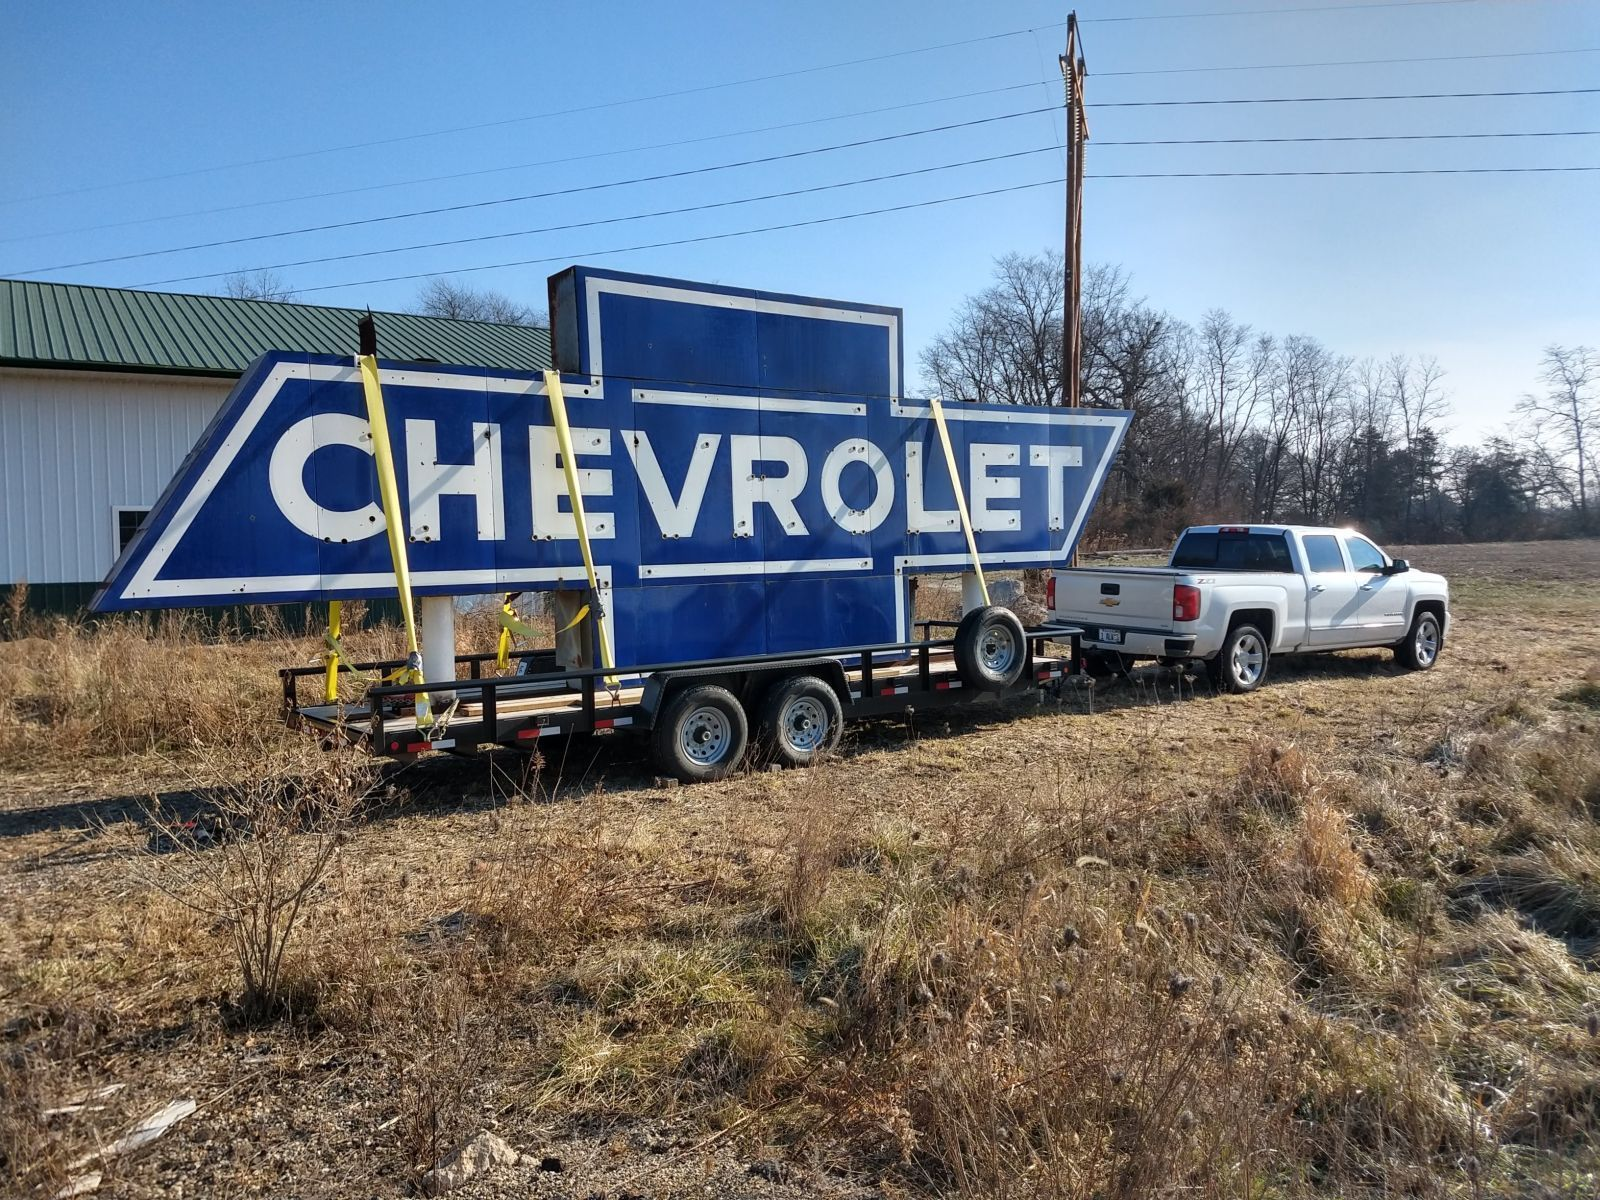 Details About Original Vintage Chevrolet Dealership Huge Porcelain Neon Sign Museum Quality Chevrolet Dealership Oil Service Porcelain Signs